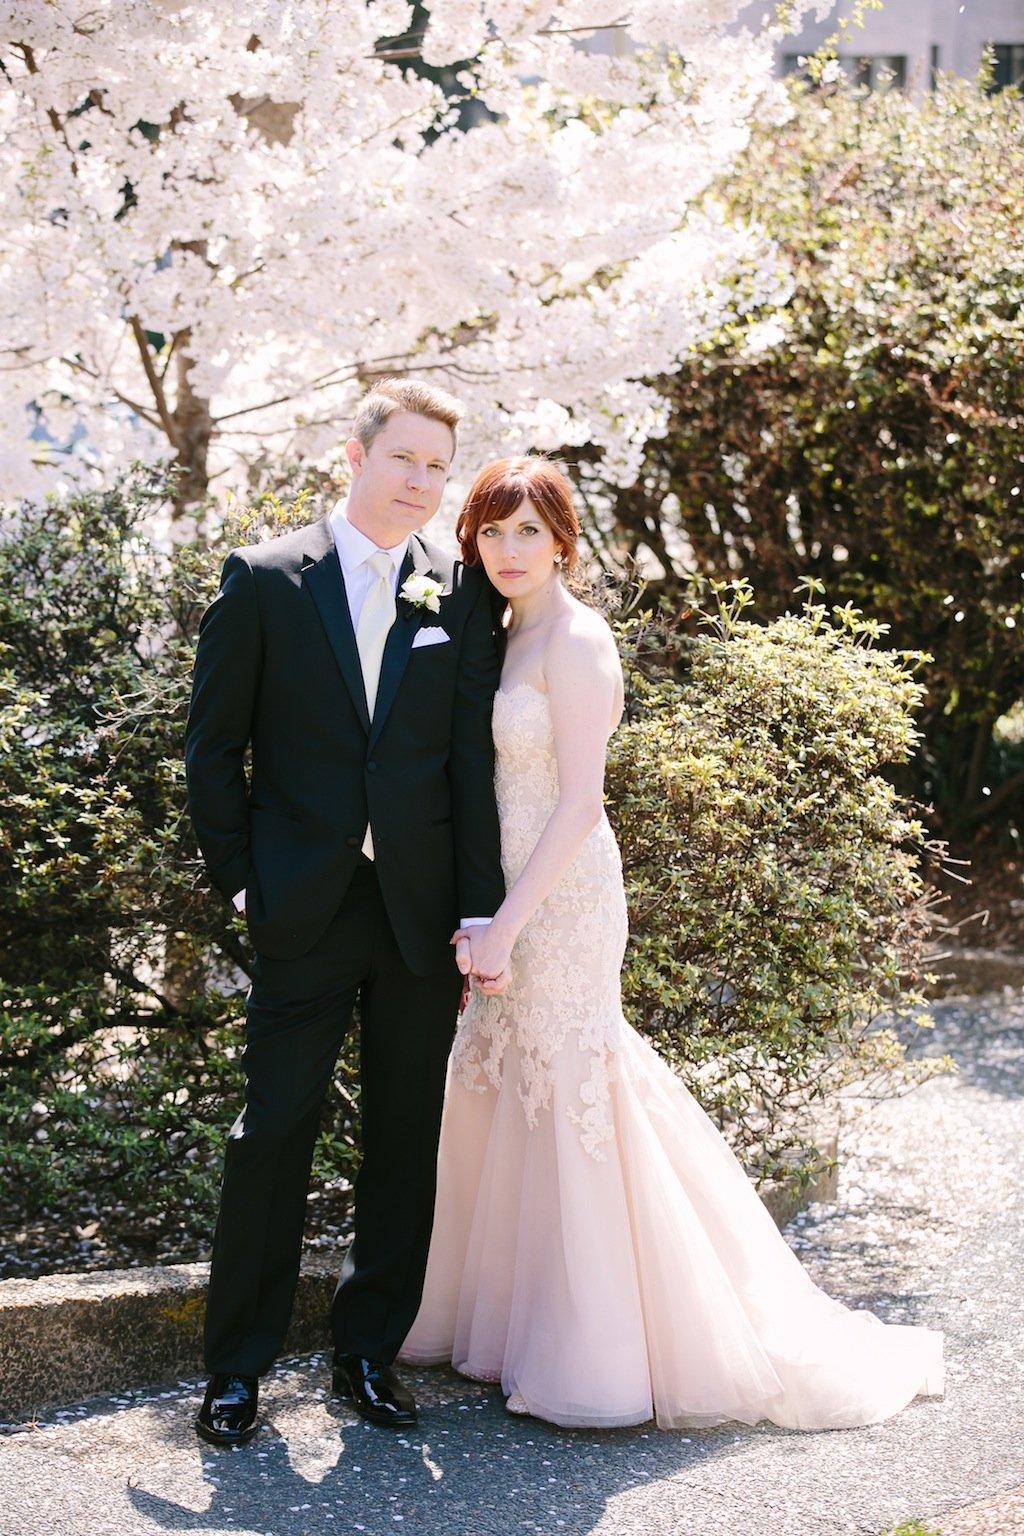 1-13-16-carnegie-institution-for-science-black-white-blush-wedding-4